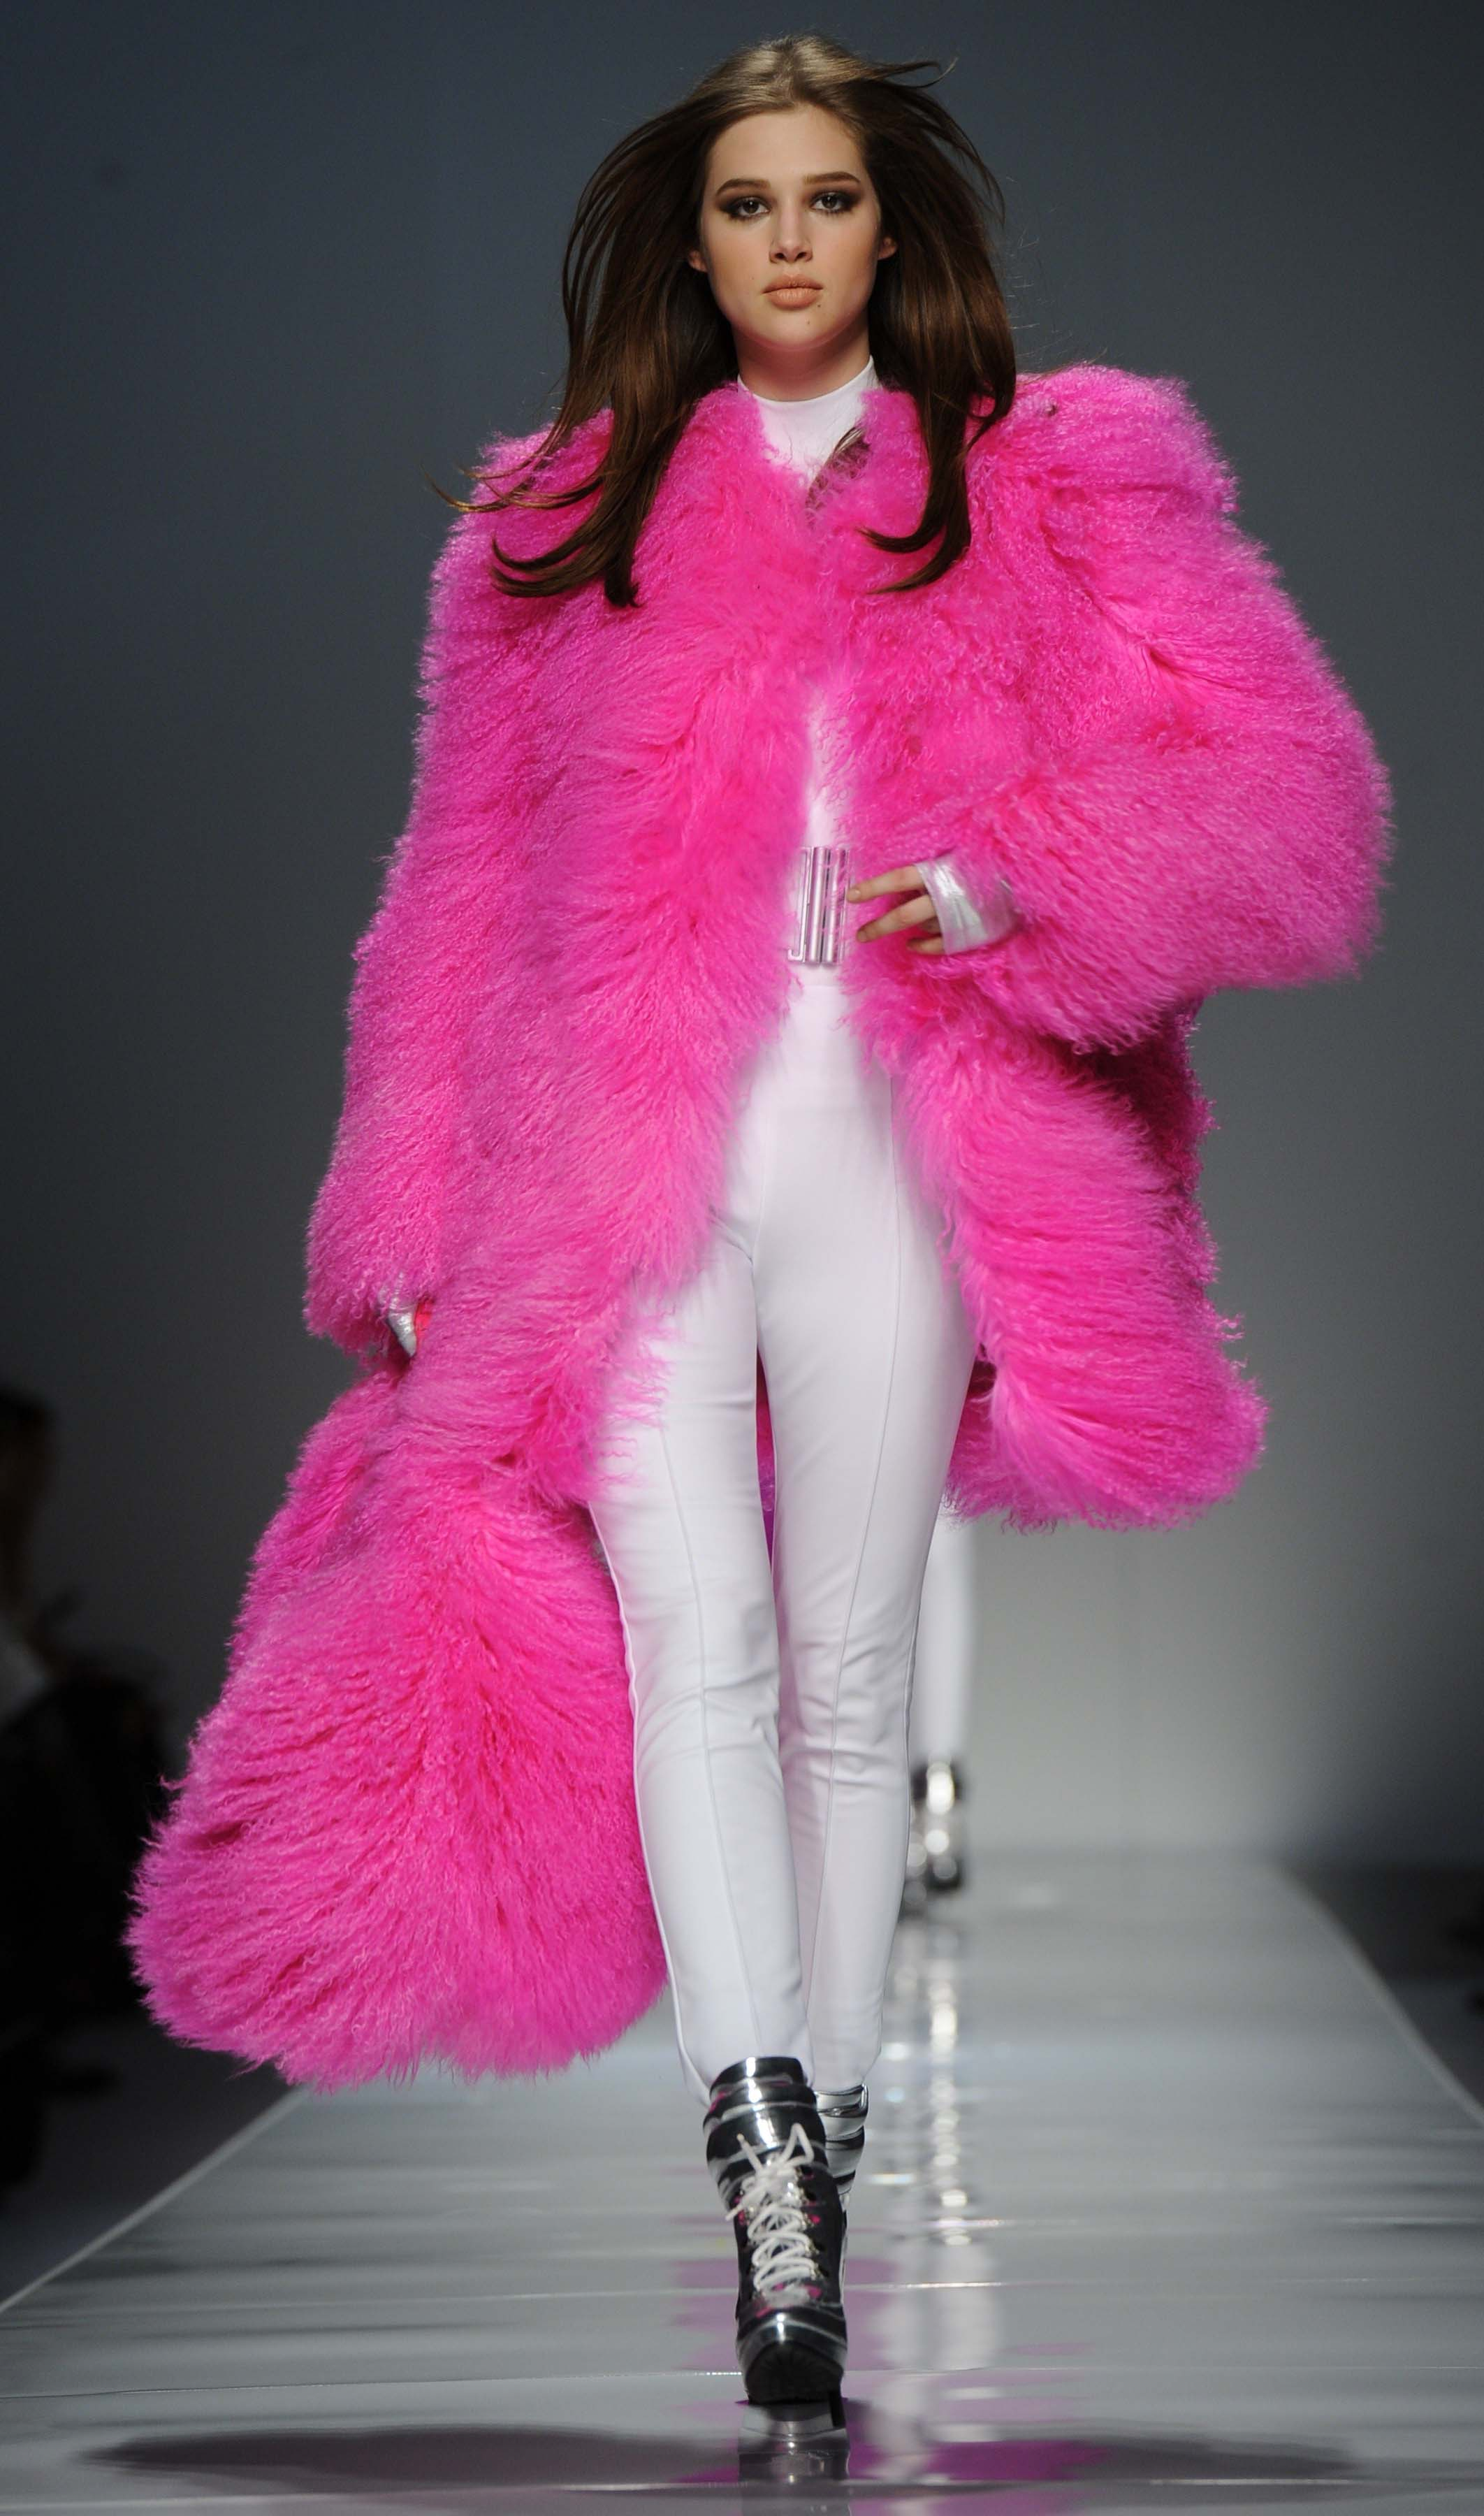 white-leggings-pink-magenta-jacket-coat-fur-fuzz-howtowear-fall-winter-hairr-lunch.jpg